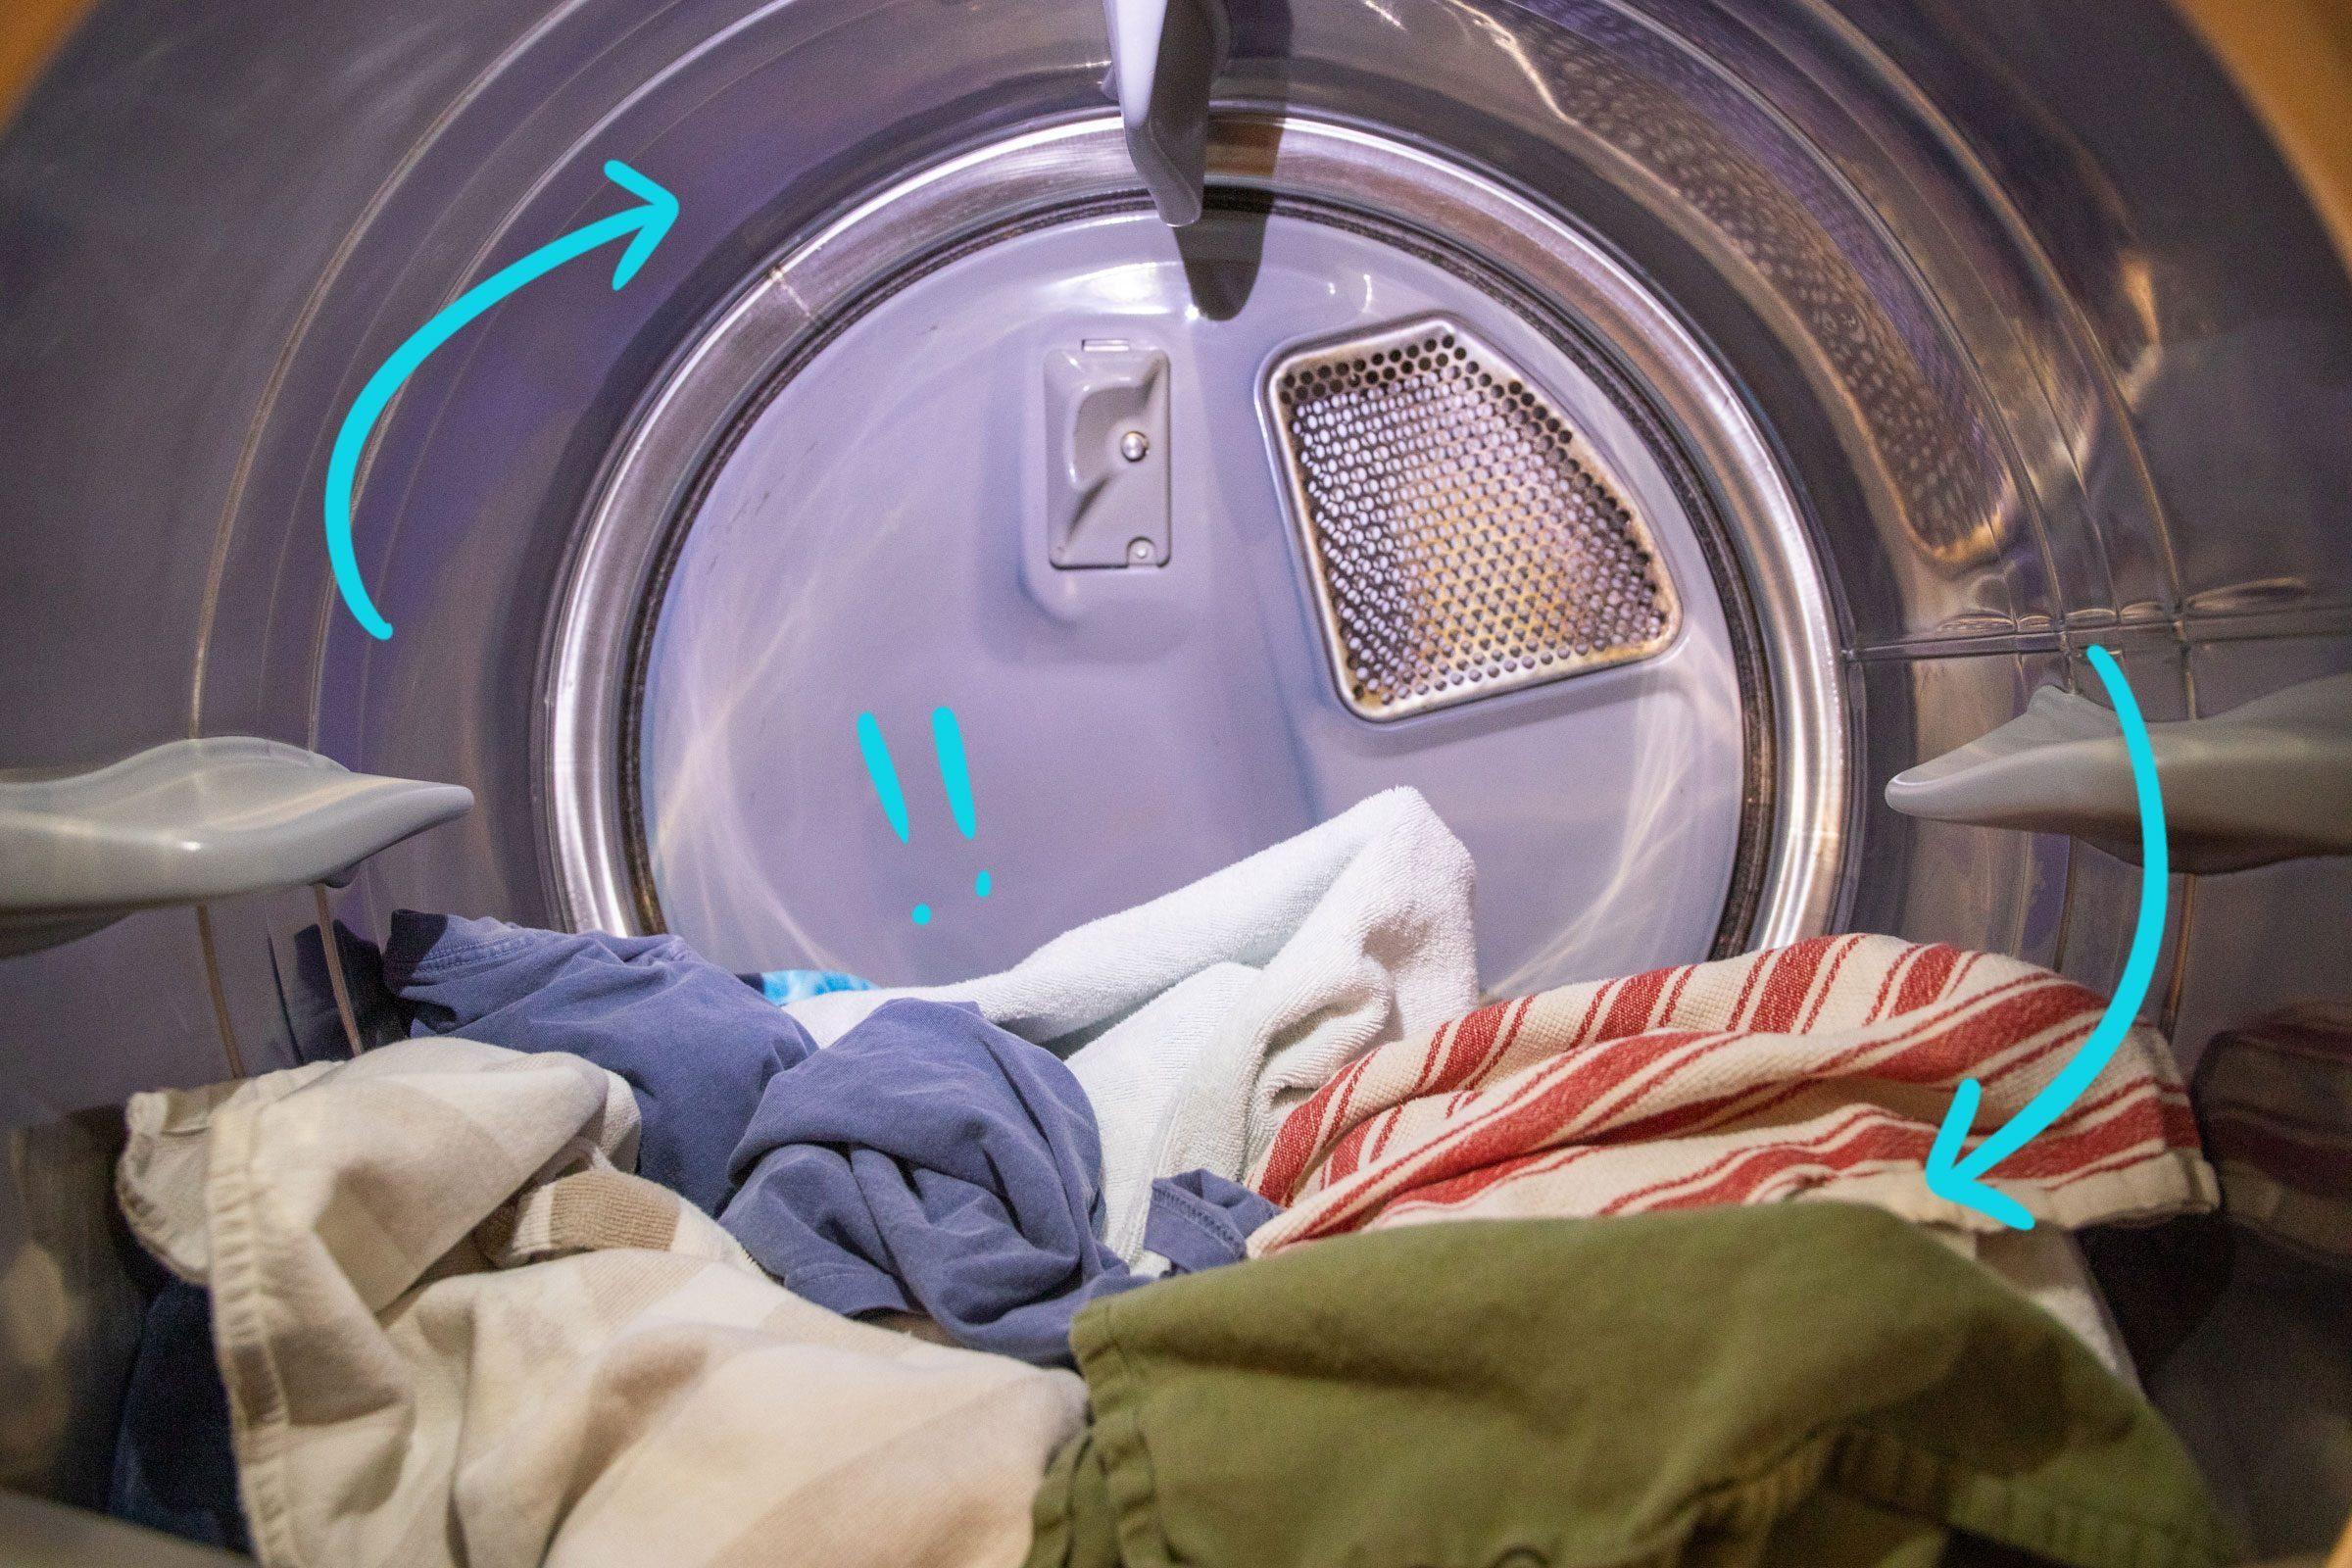 Dryer not rotating